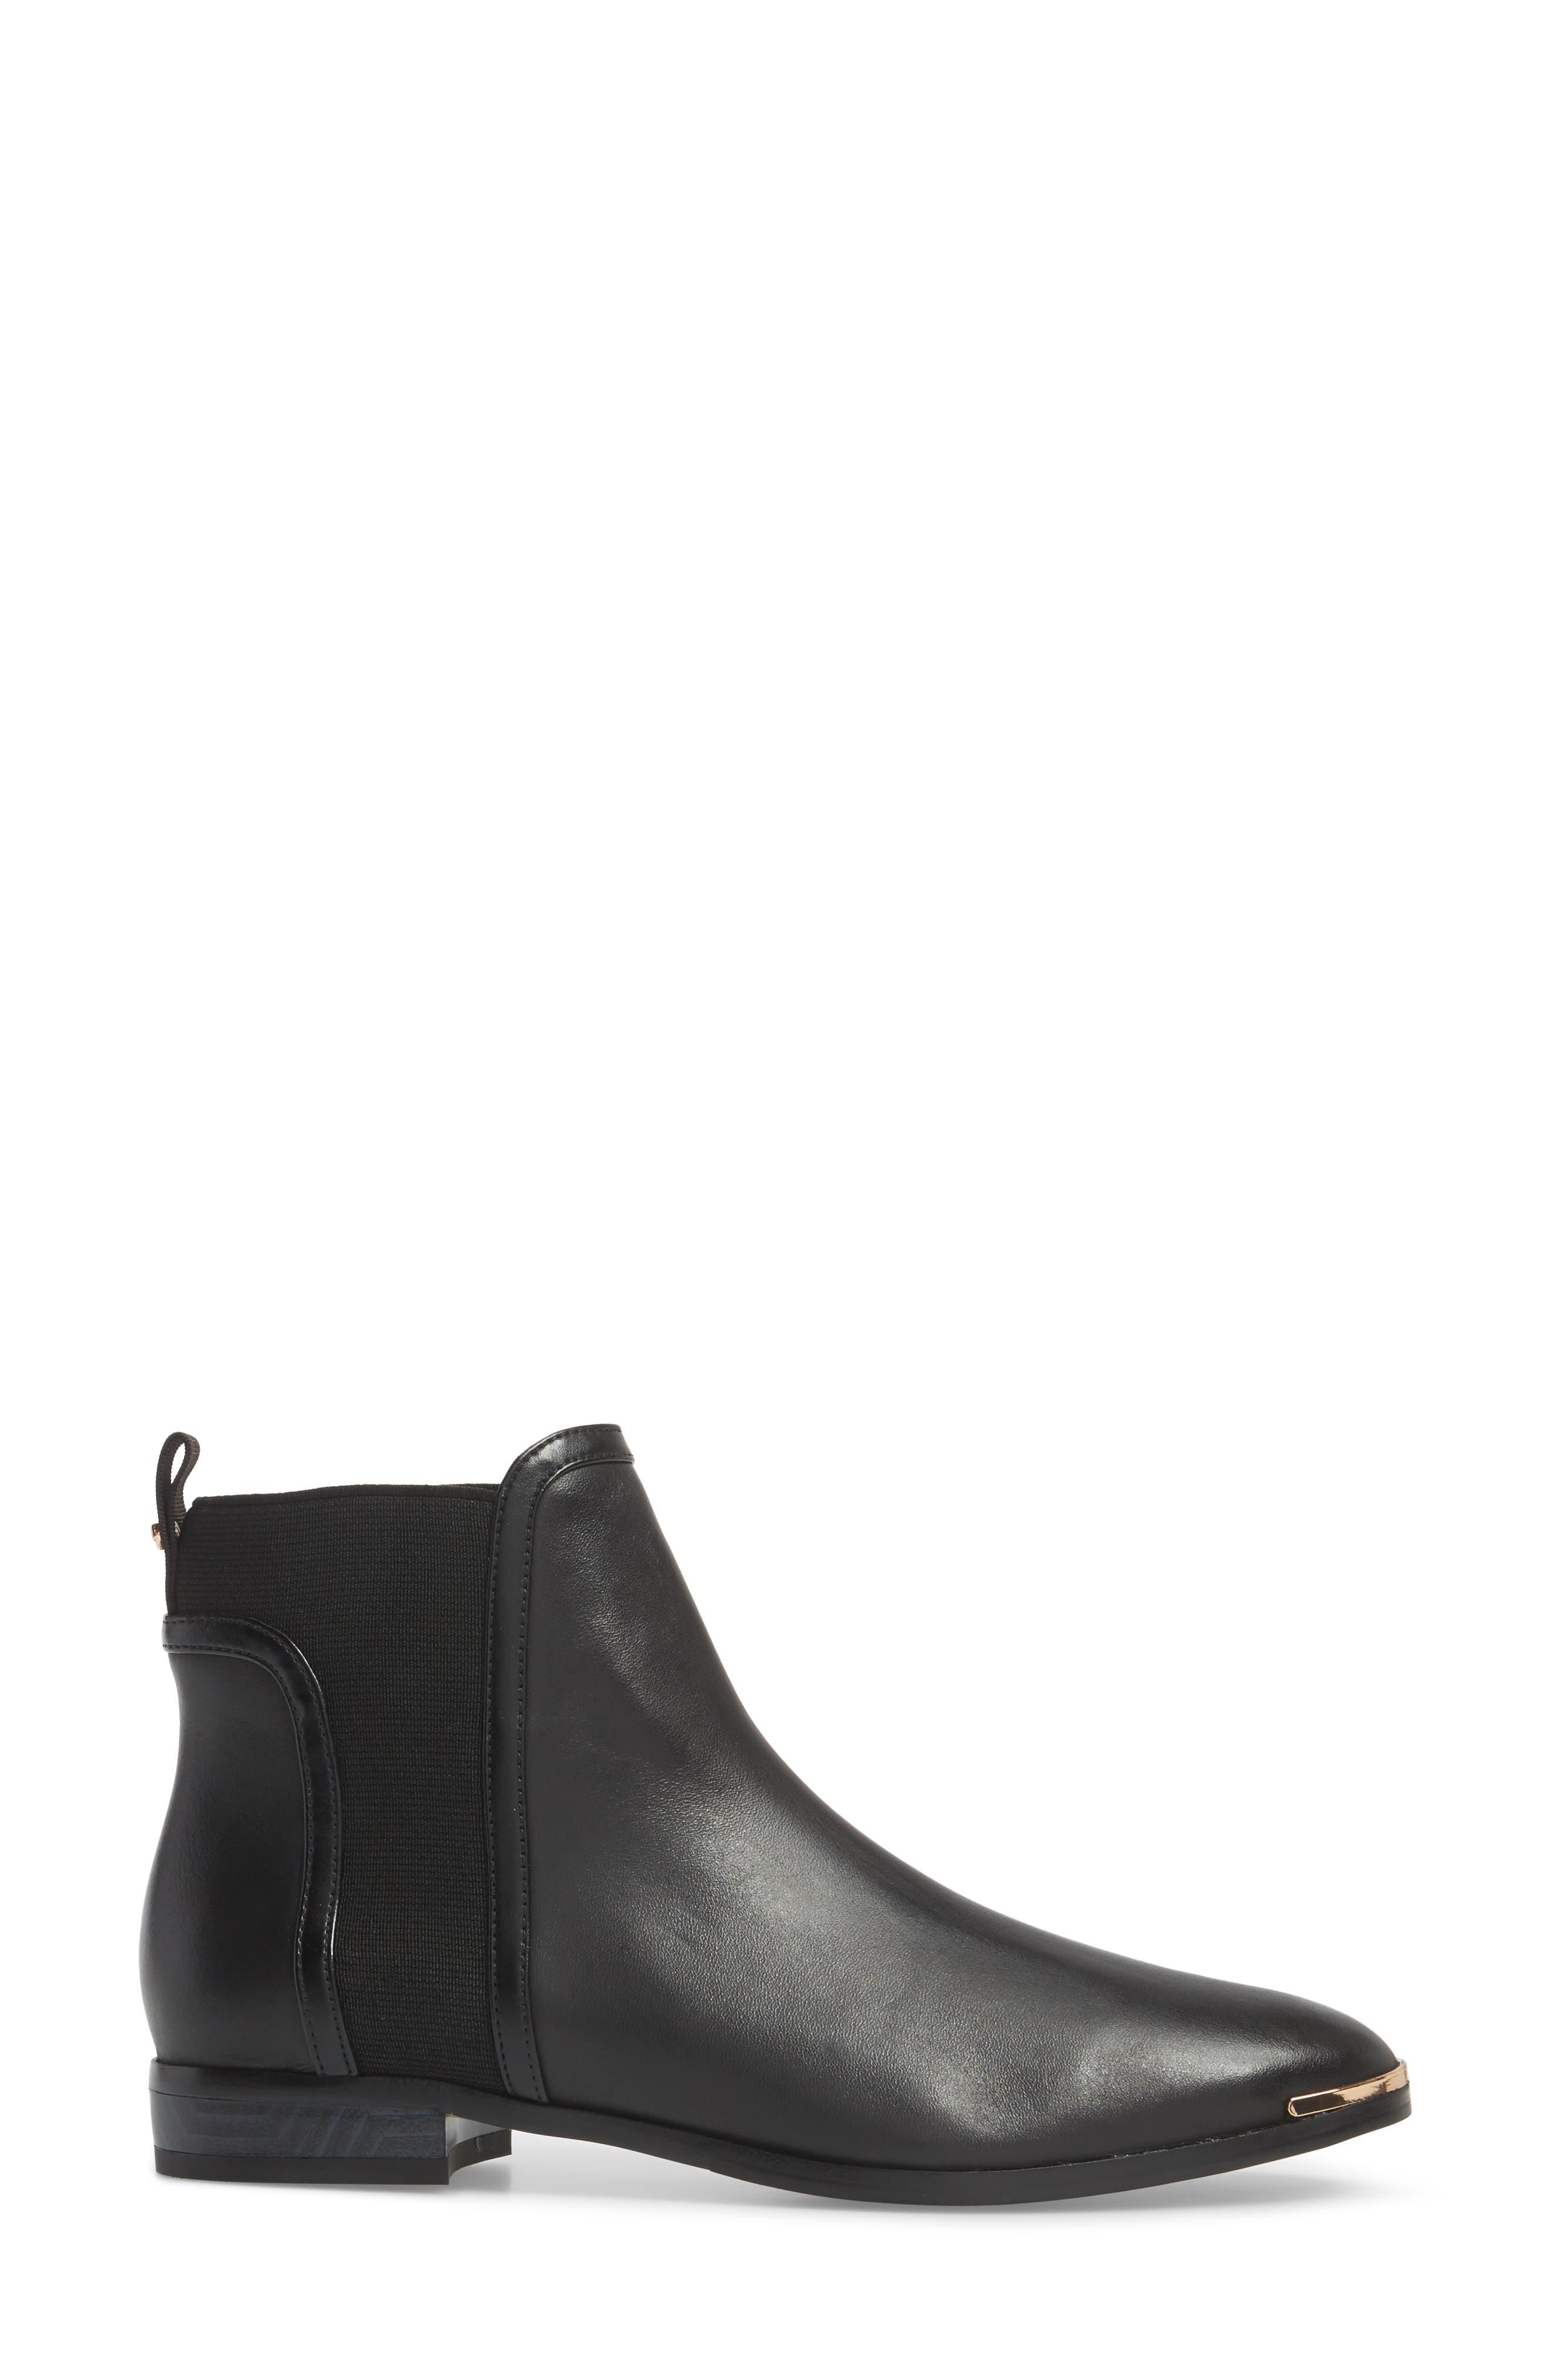 Kerei Chelsea Boot,                             Alternate thumbnail 3, color,                             Black Leather